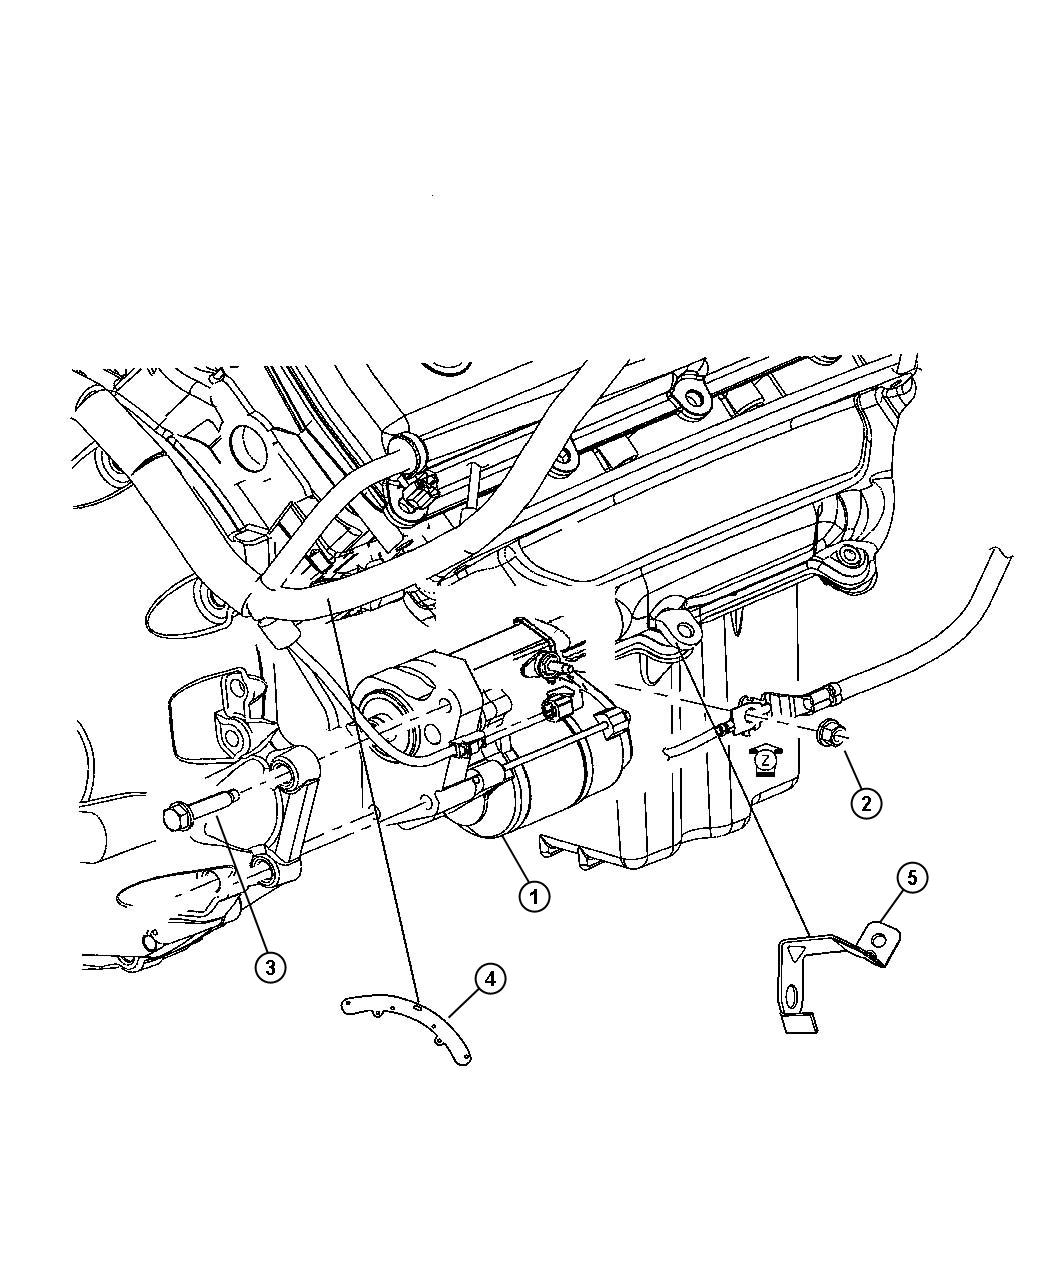 2006 Chrysler 300 Starter. Remanufactured. Engine. Related